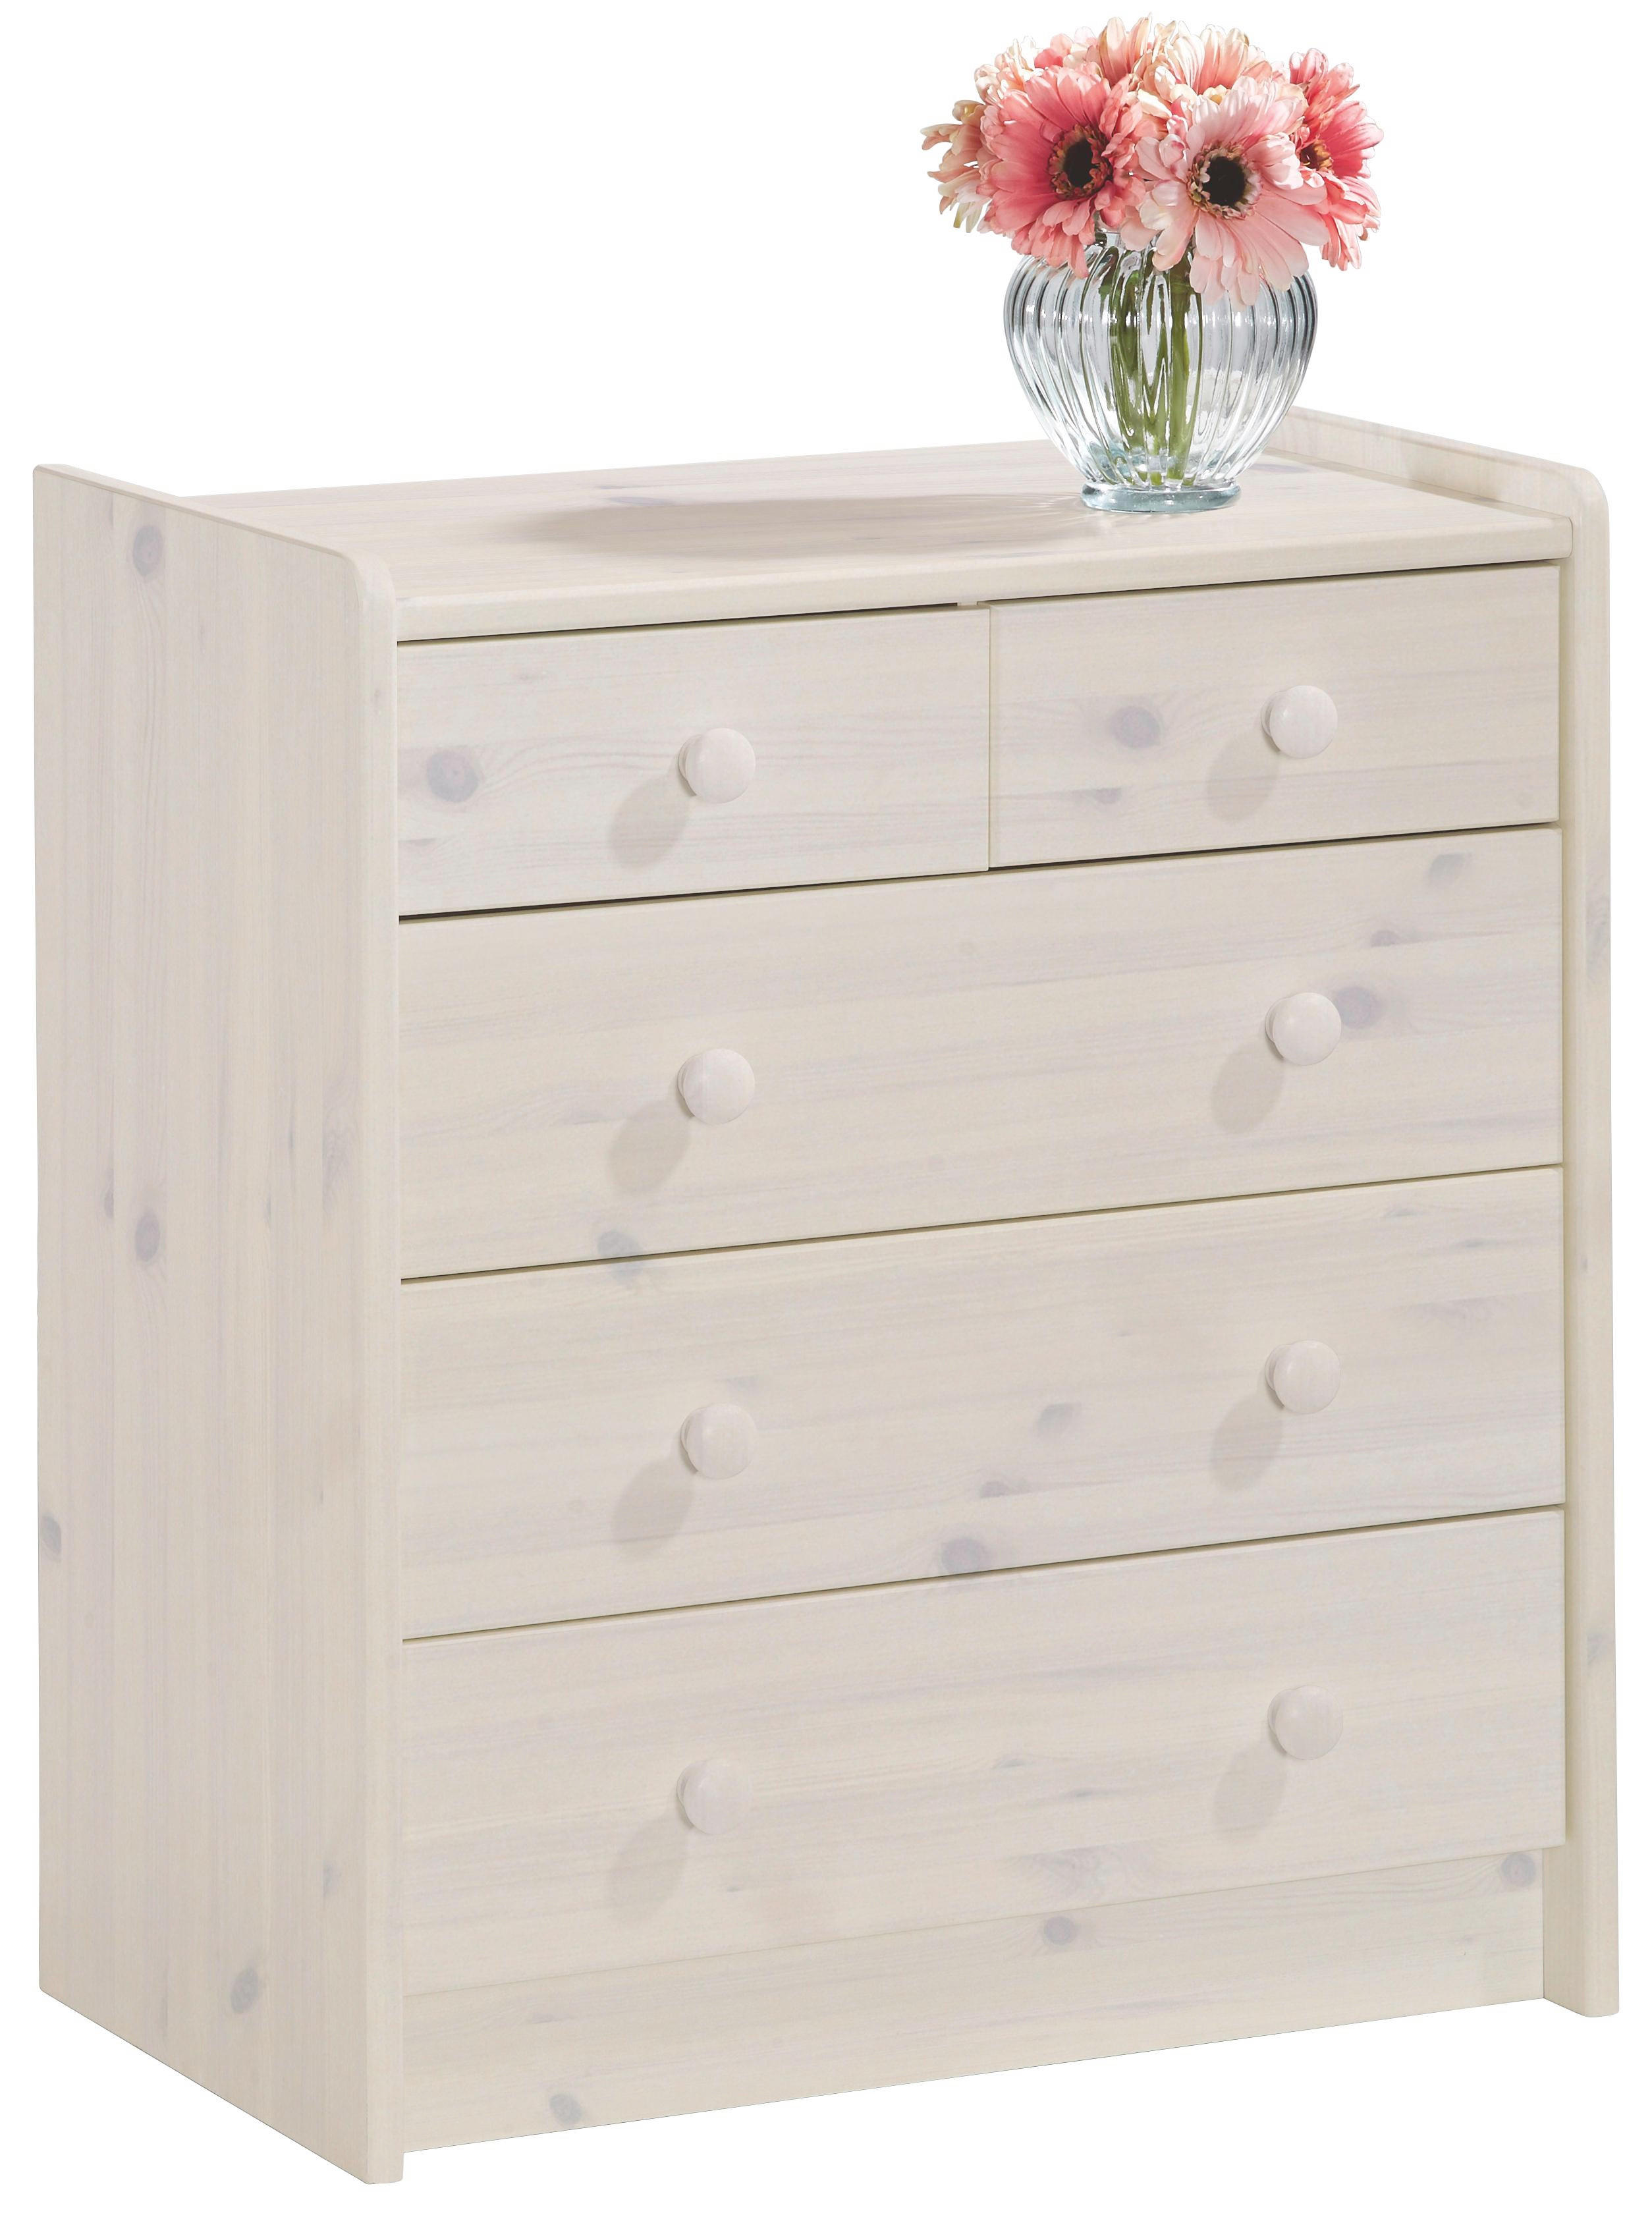 KOMMODE Kiefer massiv Weiß - Weiß, Design, Holz (64/72/38cm) - CARRYHOME